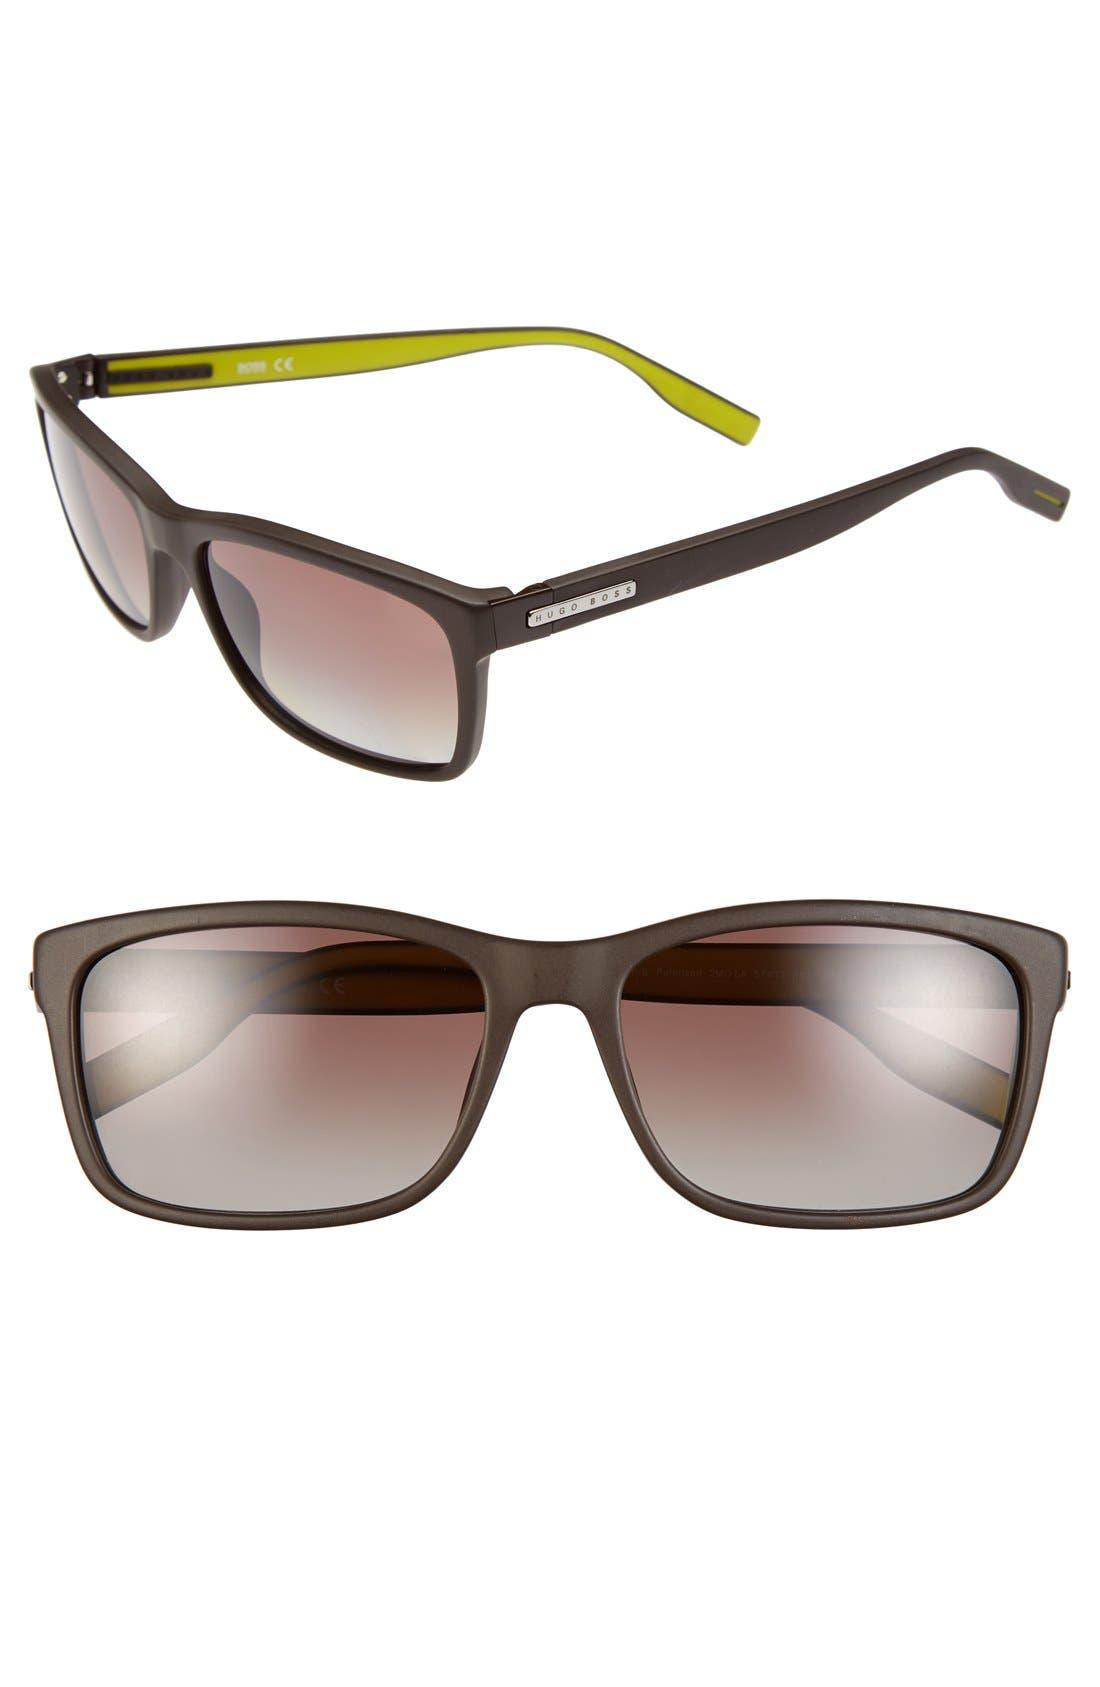 57mm Polarized Retro Sunglasses,                             Main thumbnail 2, color,